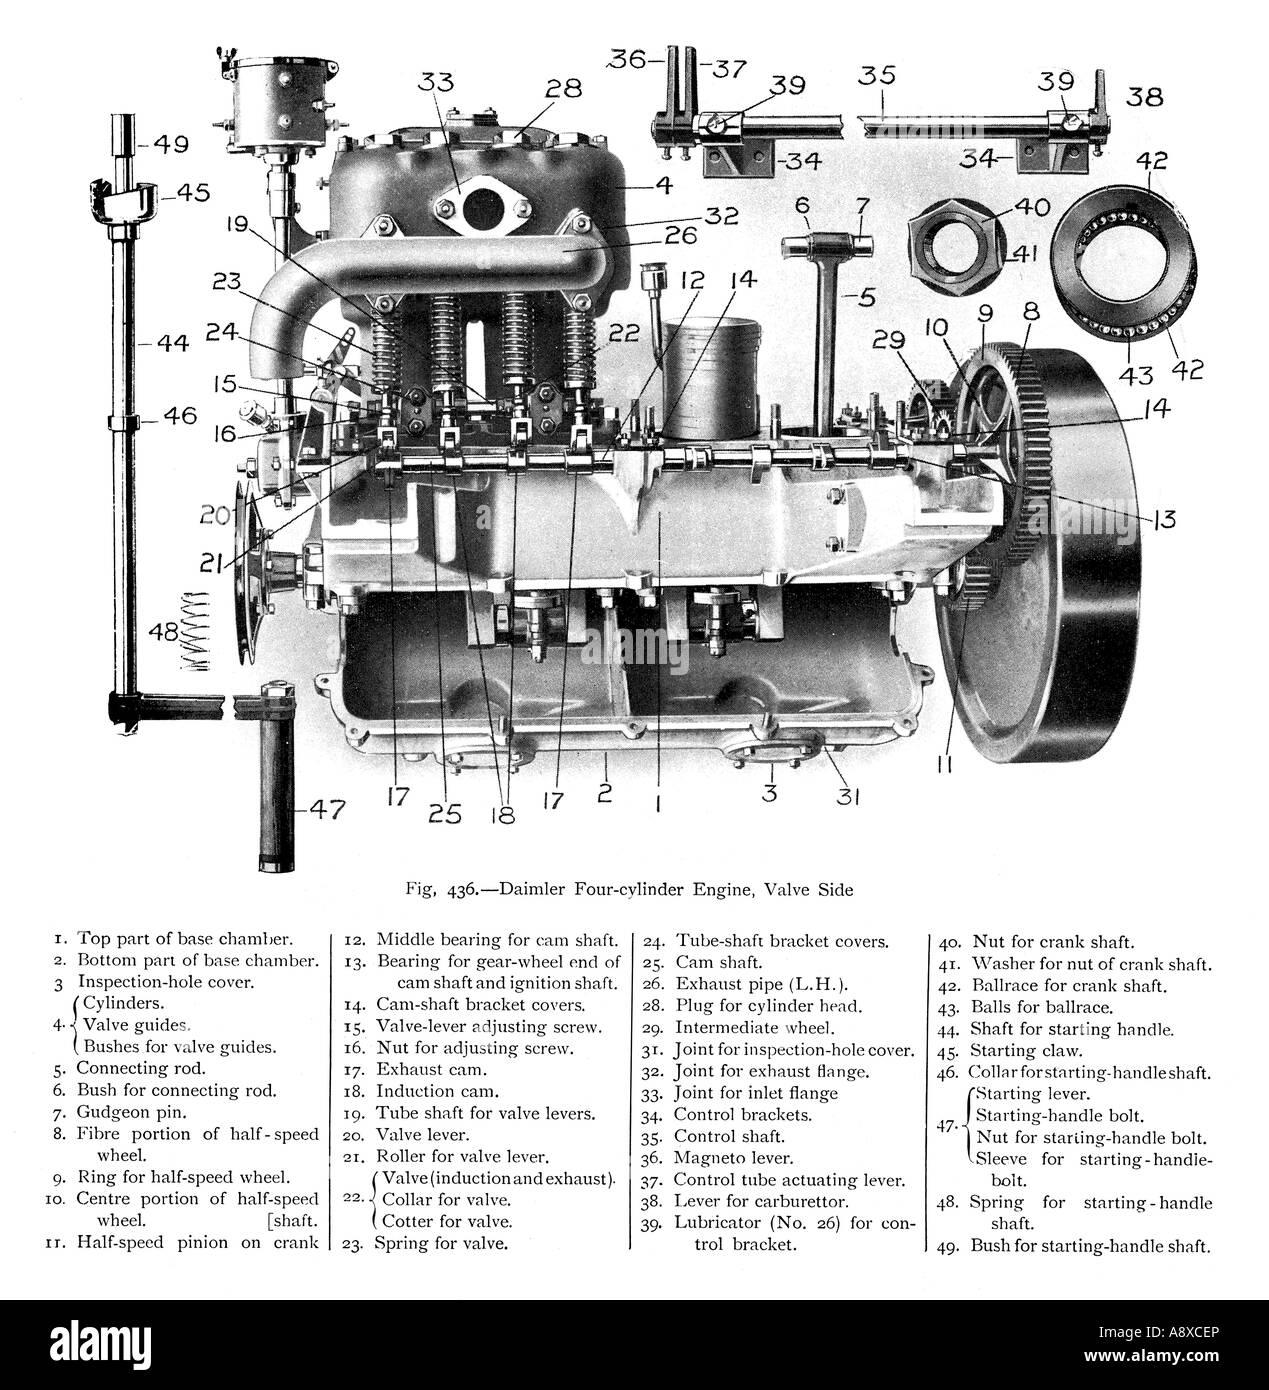 basic 4 cylinder engine diagram wiring diagram origin4 cylinder car engine diagram wiring diagrams honda 4 cylinder engine diagram 4 cylinder car engine